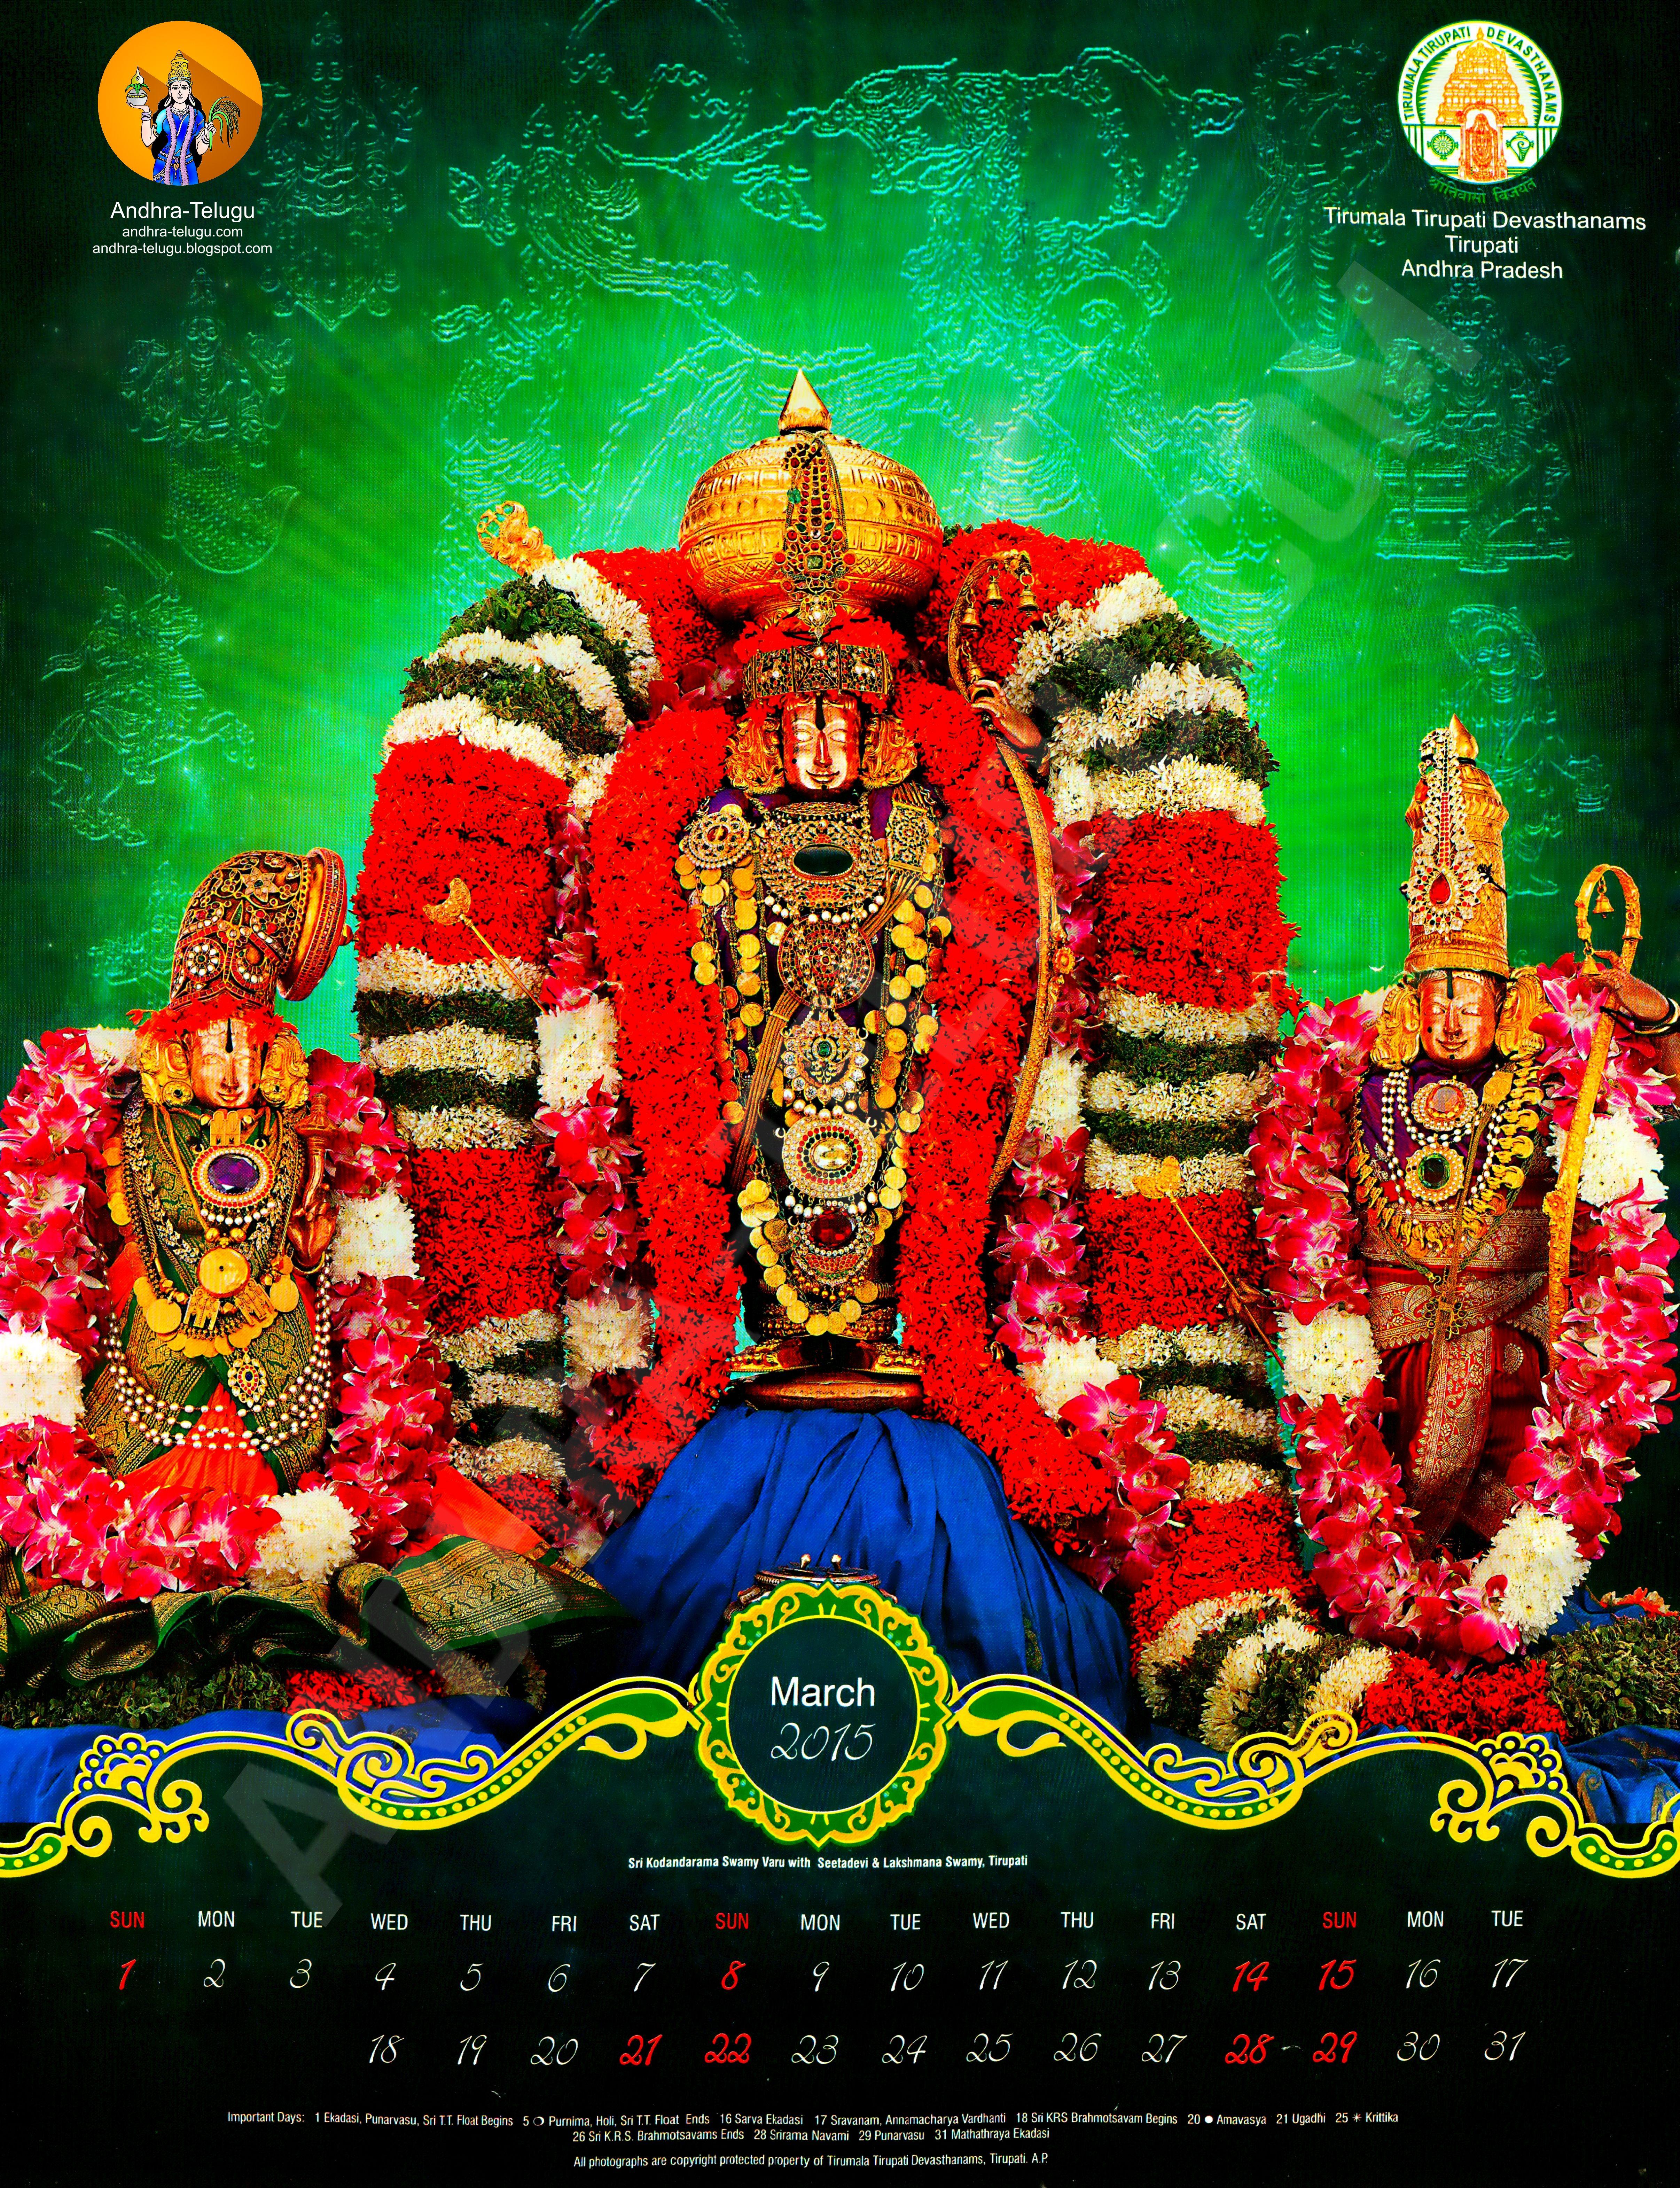 The 2015 Tirumala Tirupati Devasthanams calendar is now available on ...